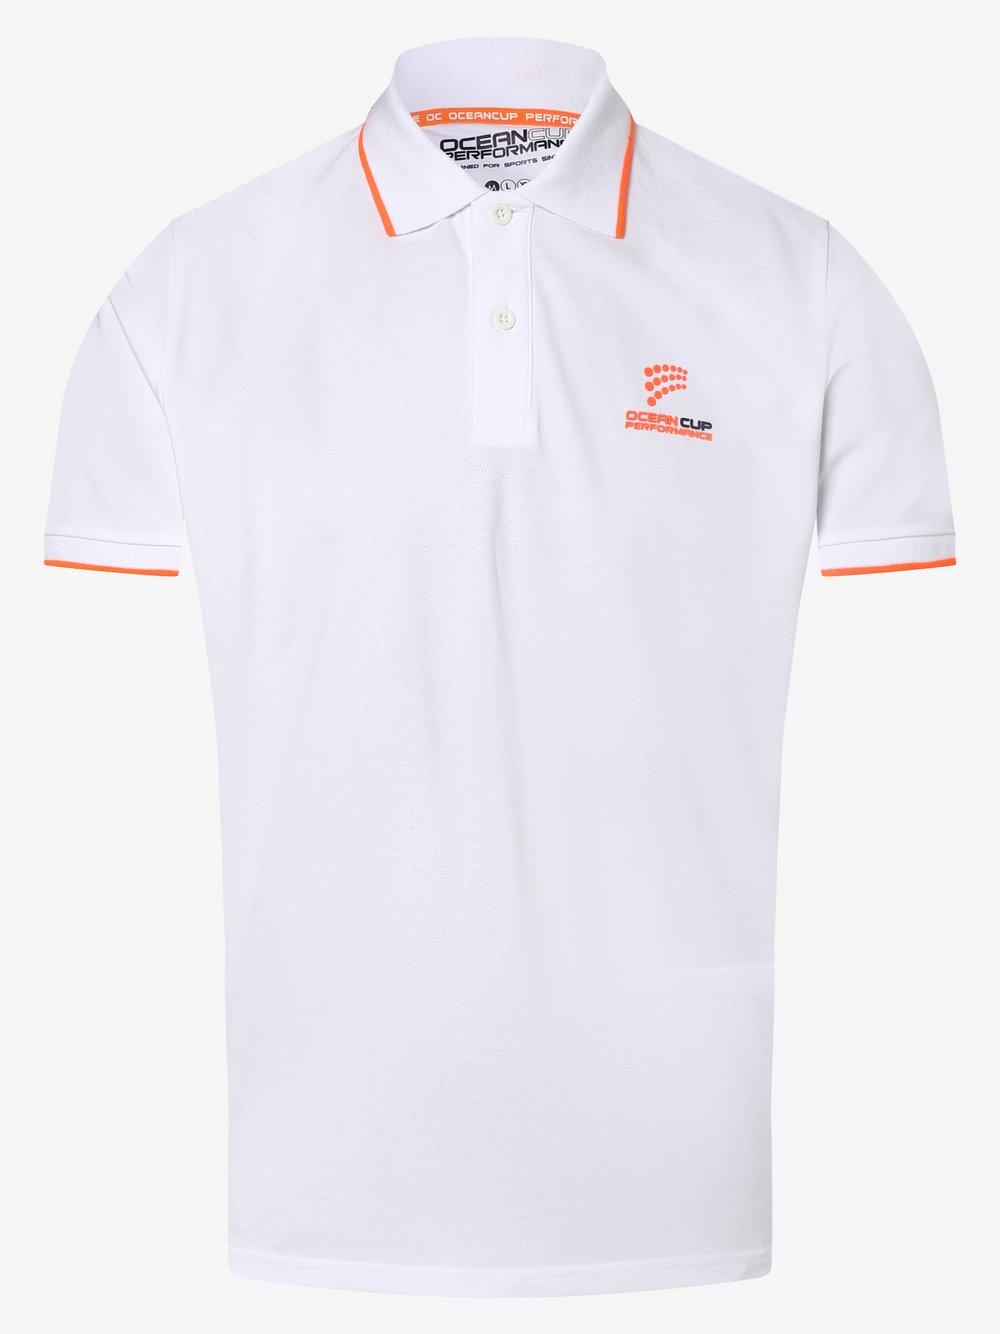 Ocean Cup - Męska koszulka polo, biały